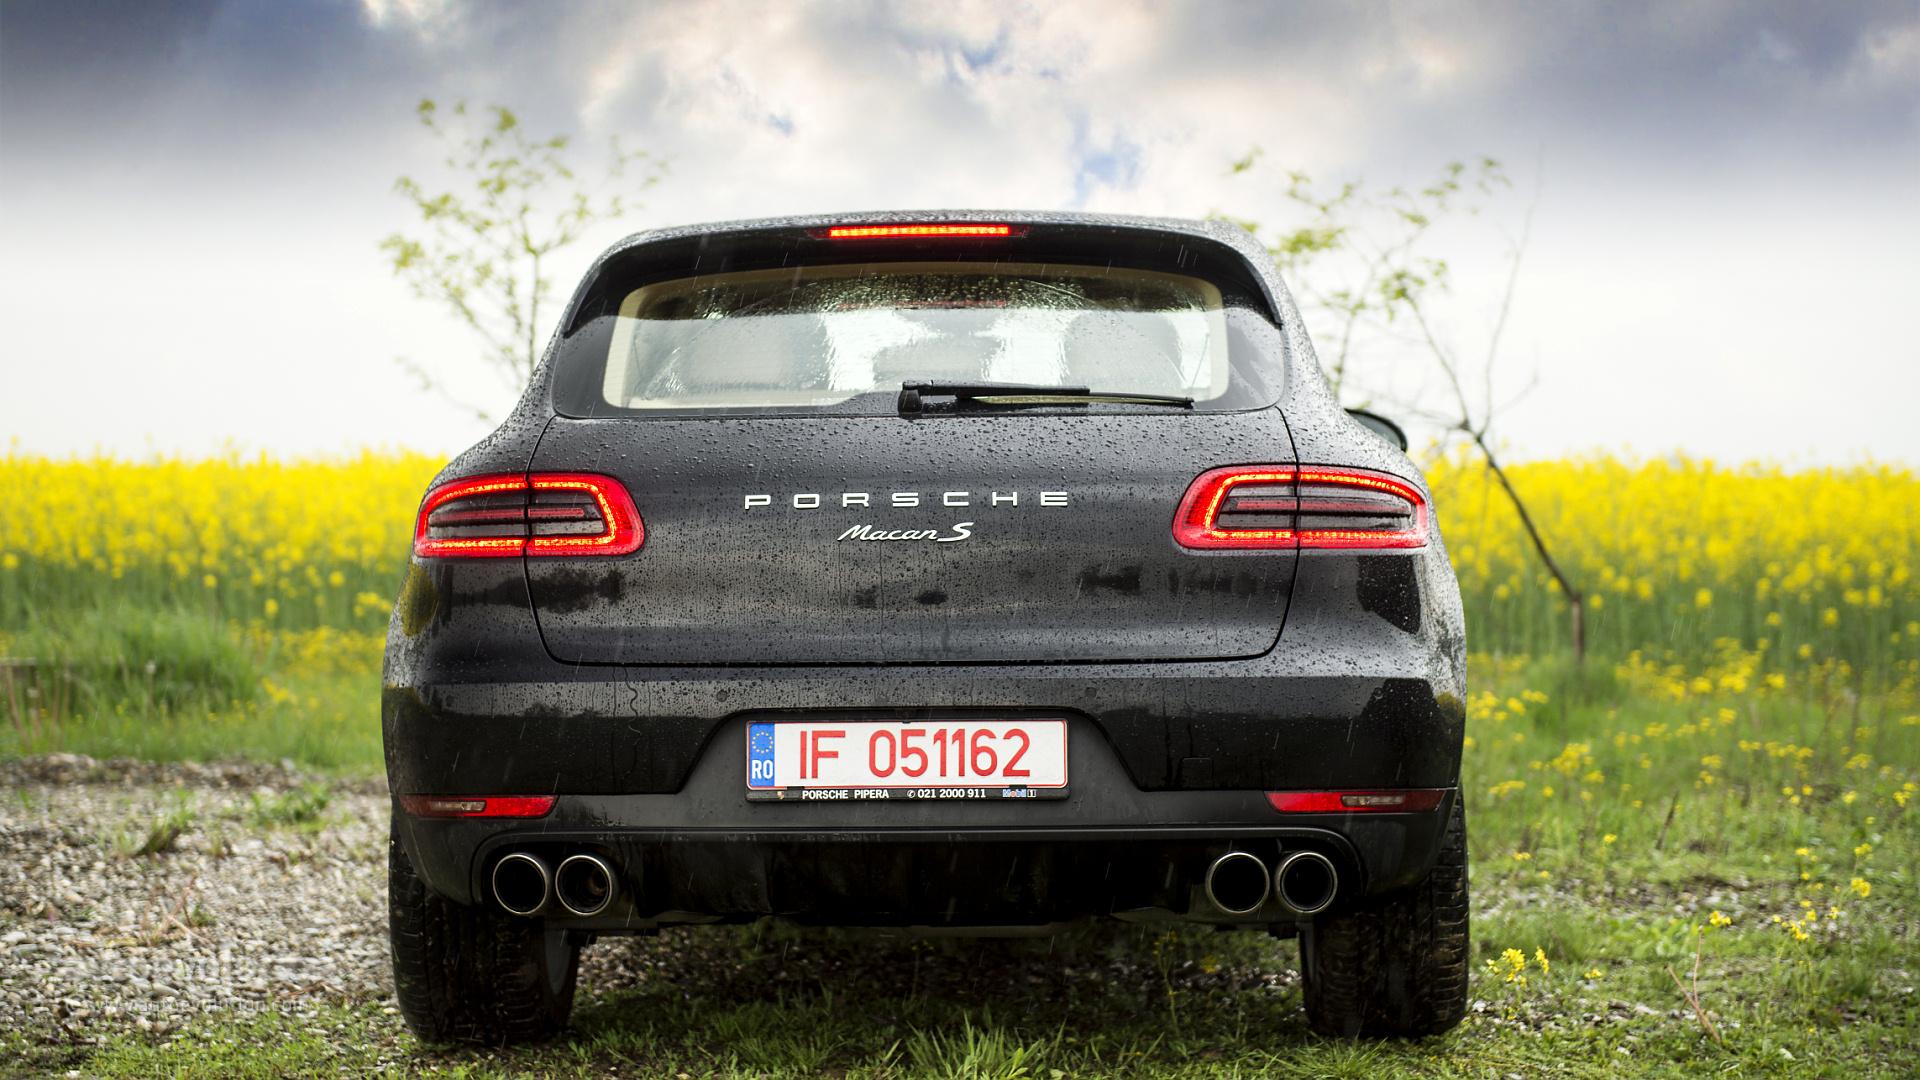 Porsche Macan S Review Autoevolution